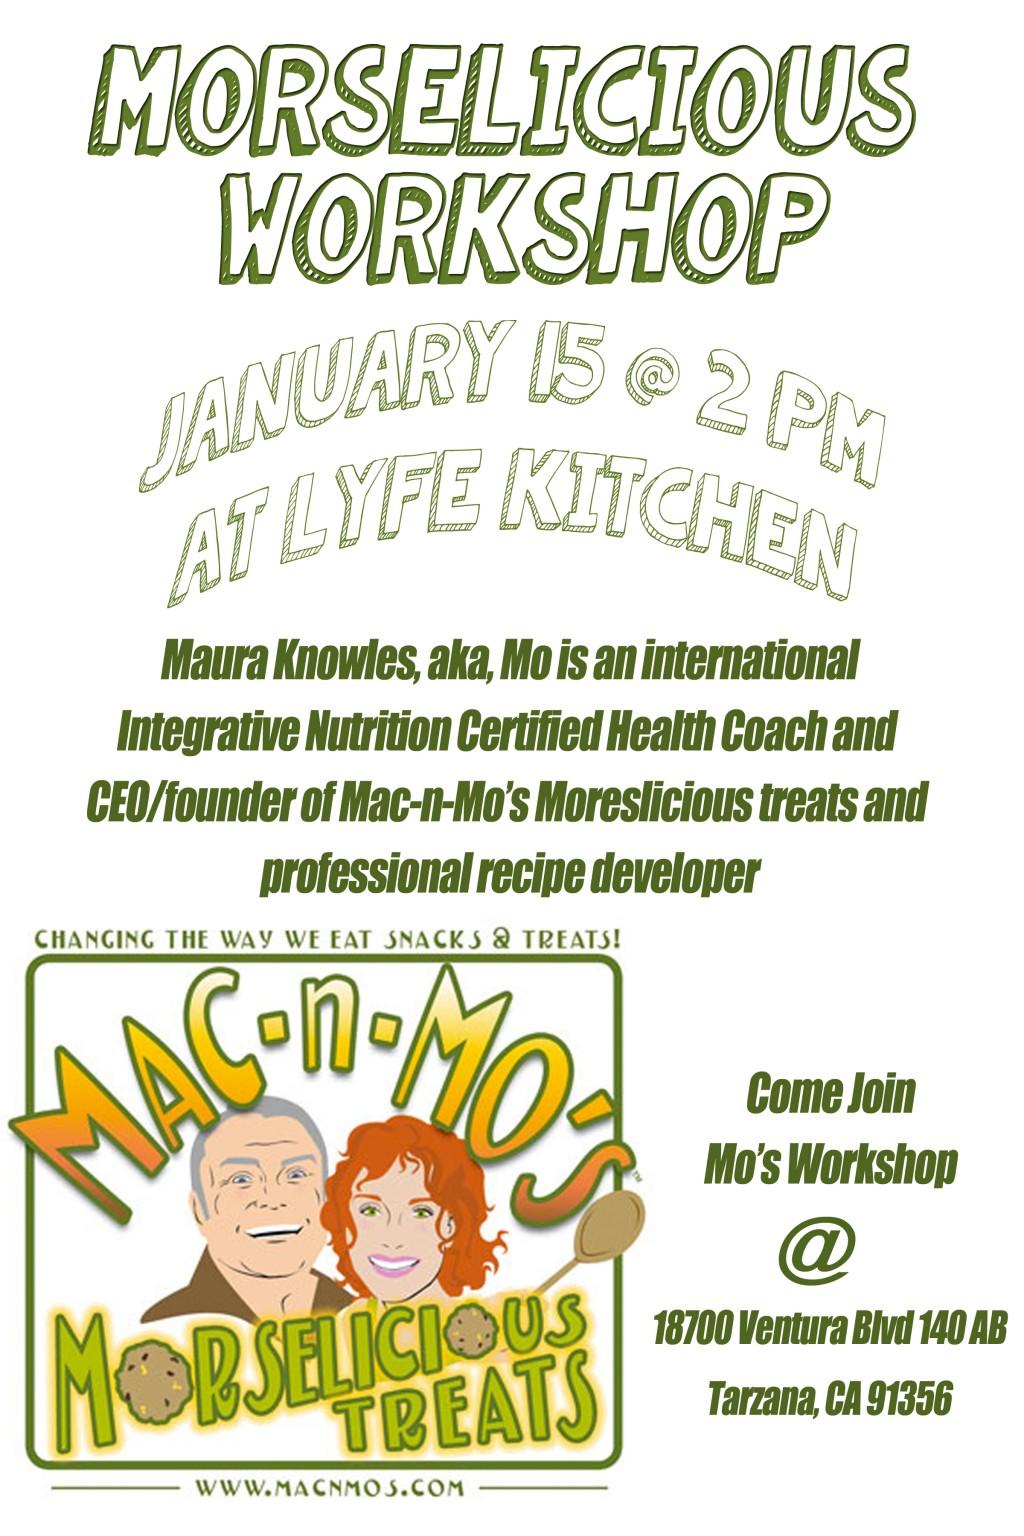 Morselicious Workshop-LYFE Kitchen